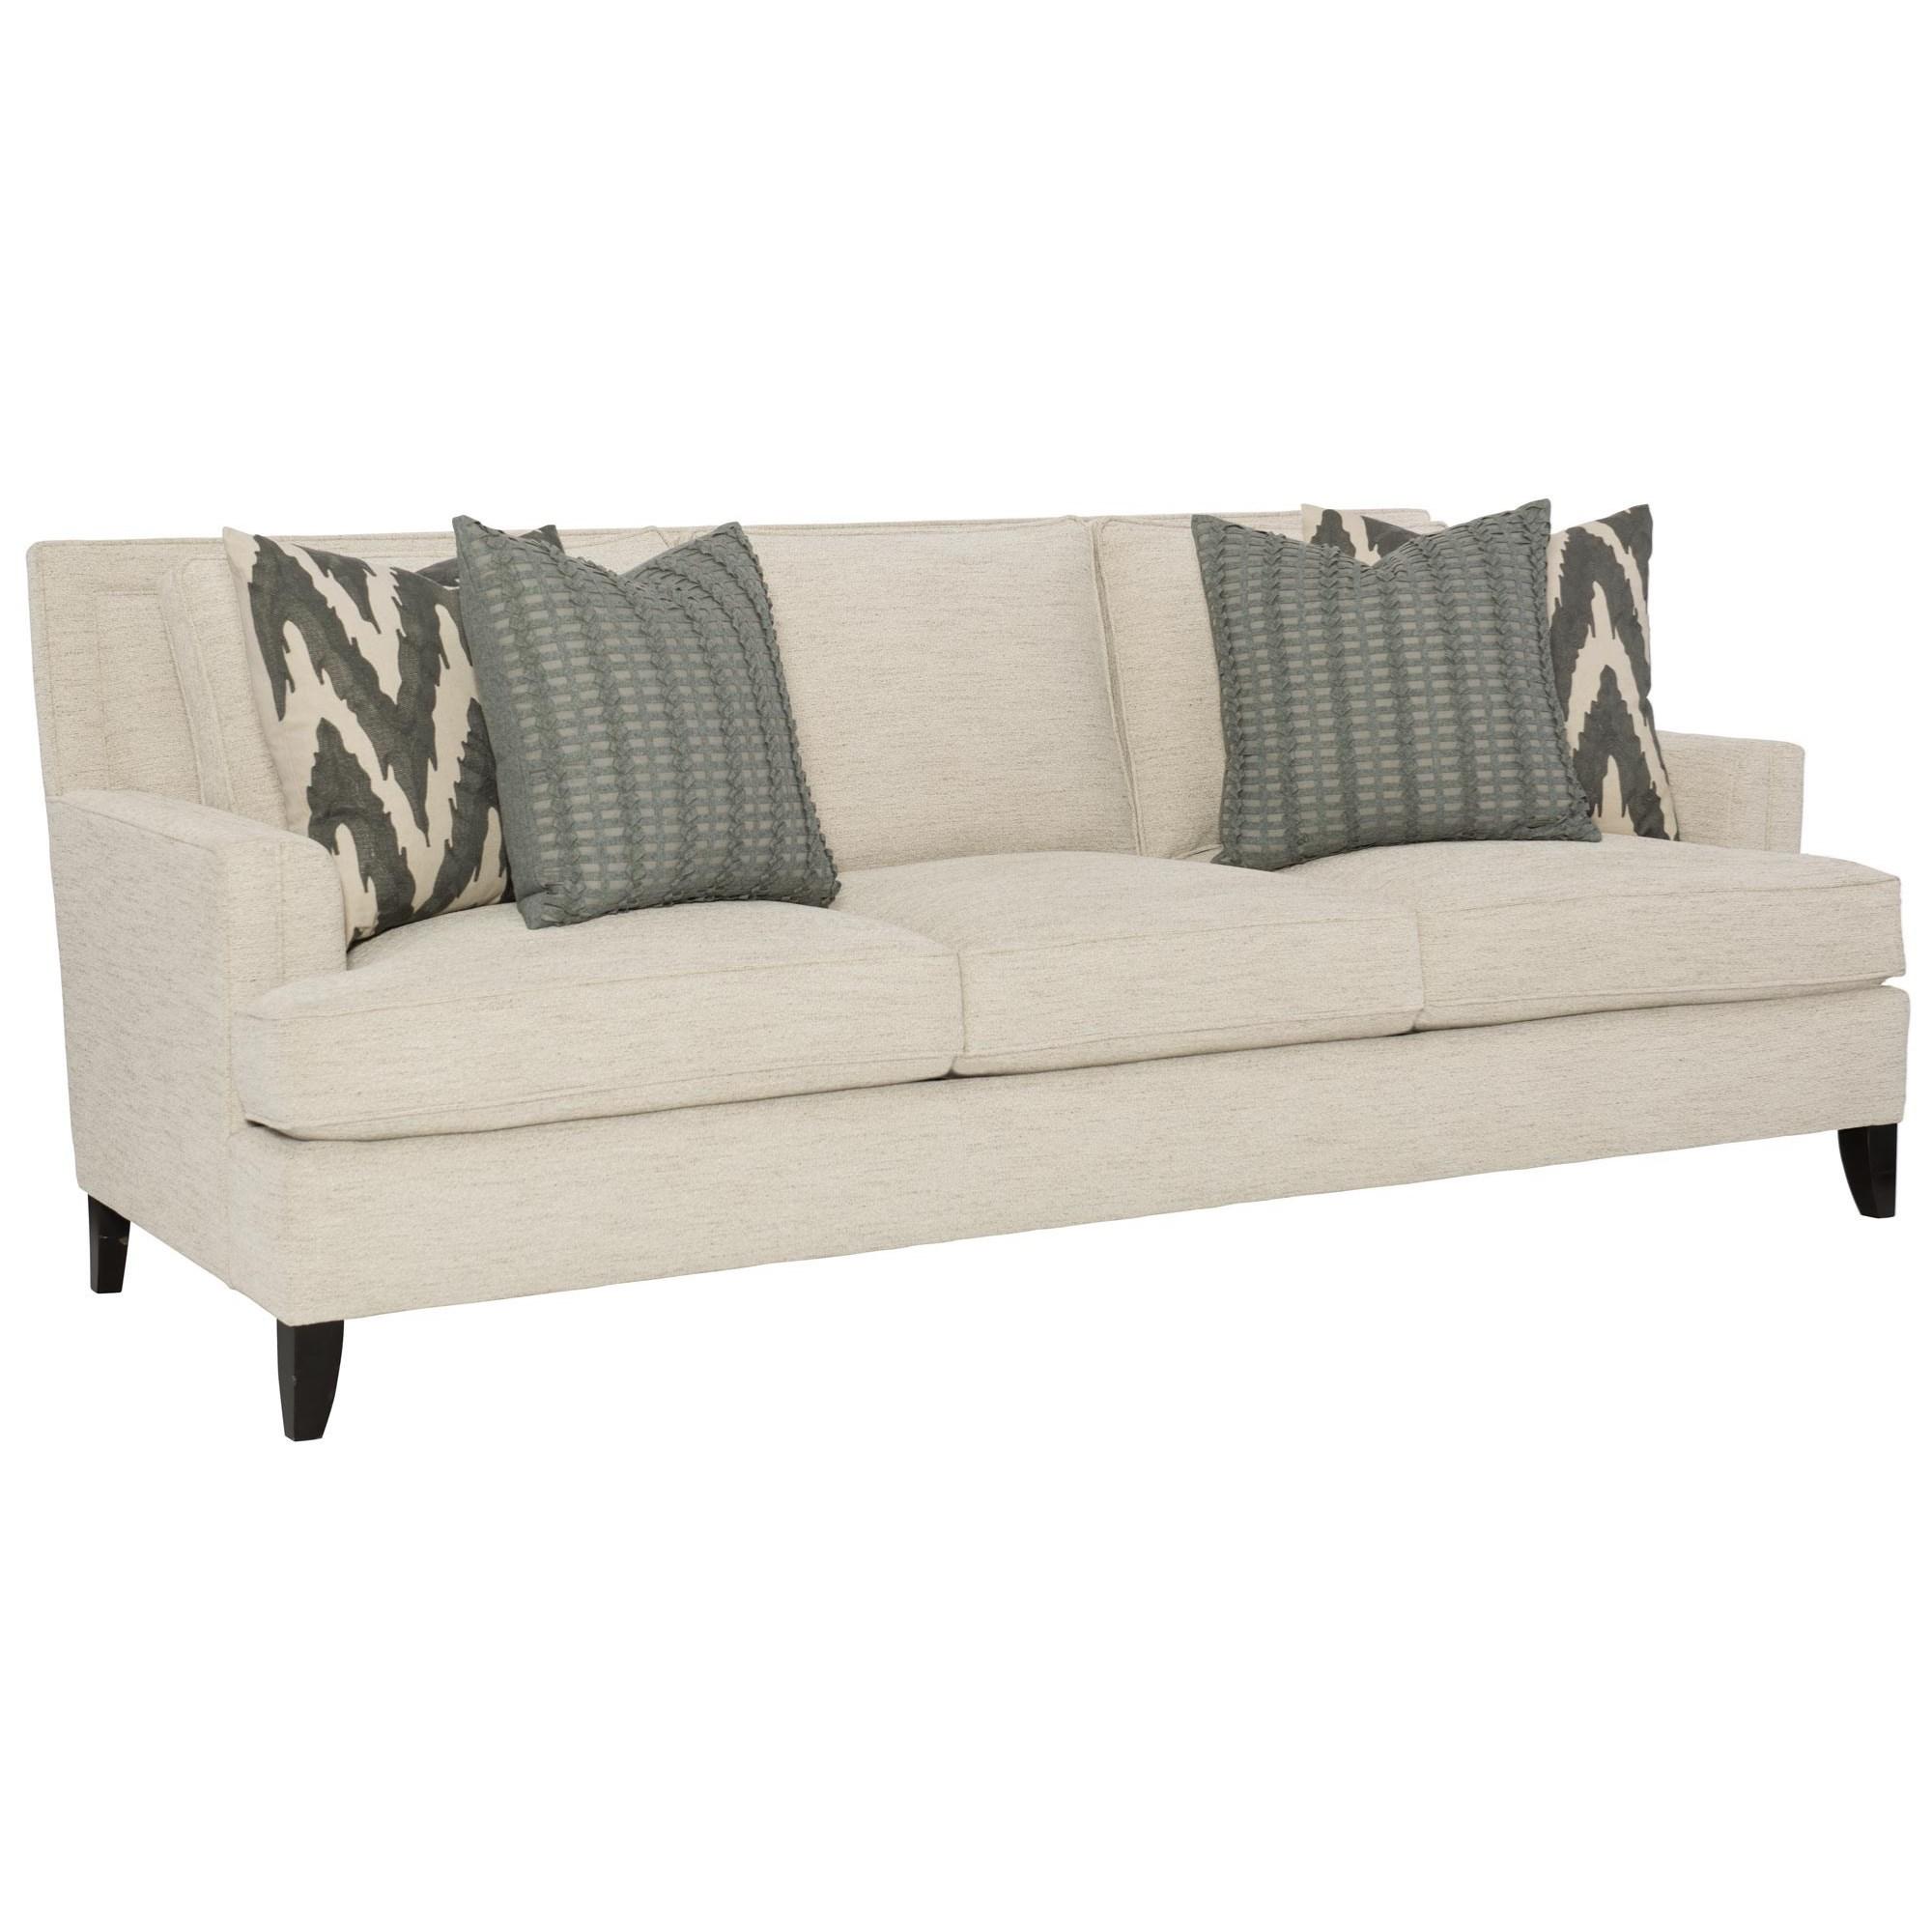 Genial Bernhardt AddisonCasual Styled Sofa ...